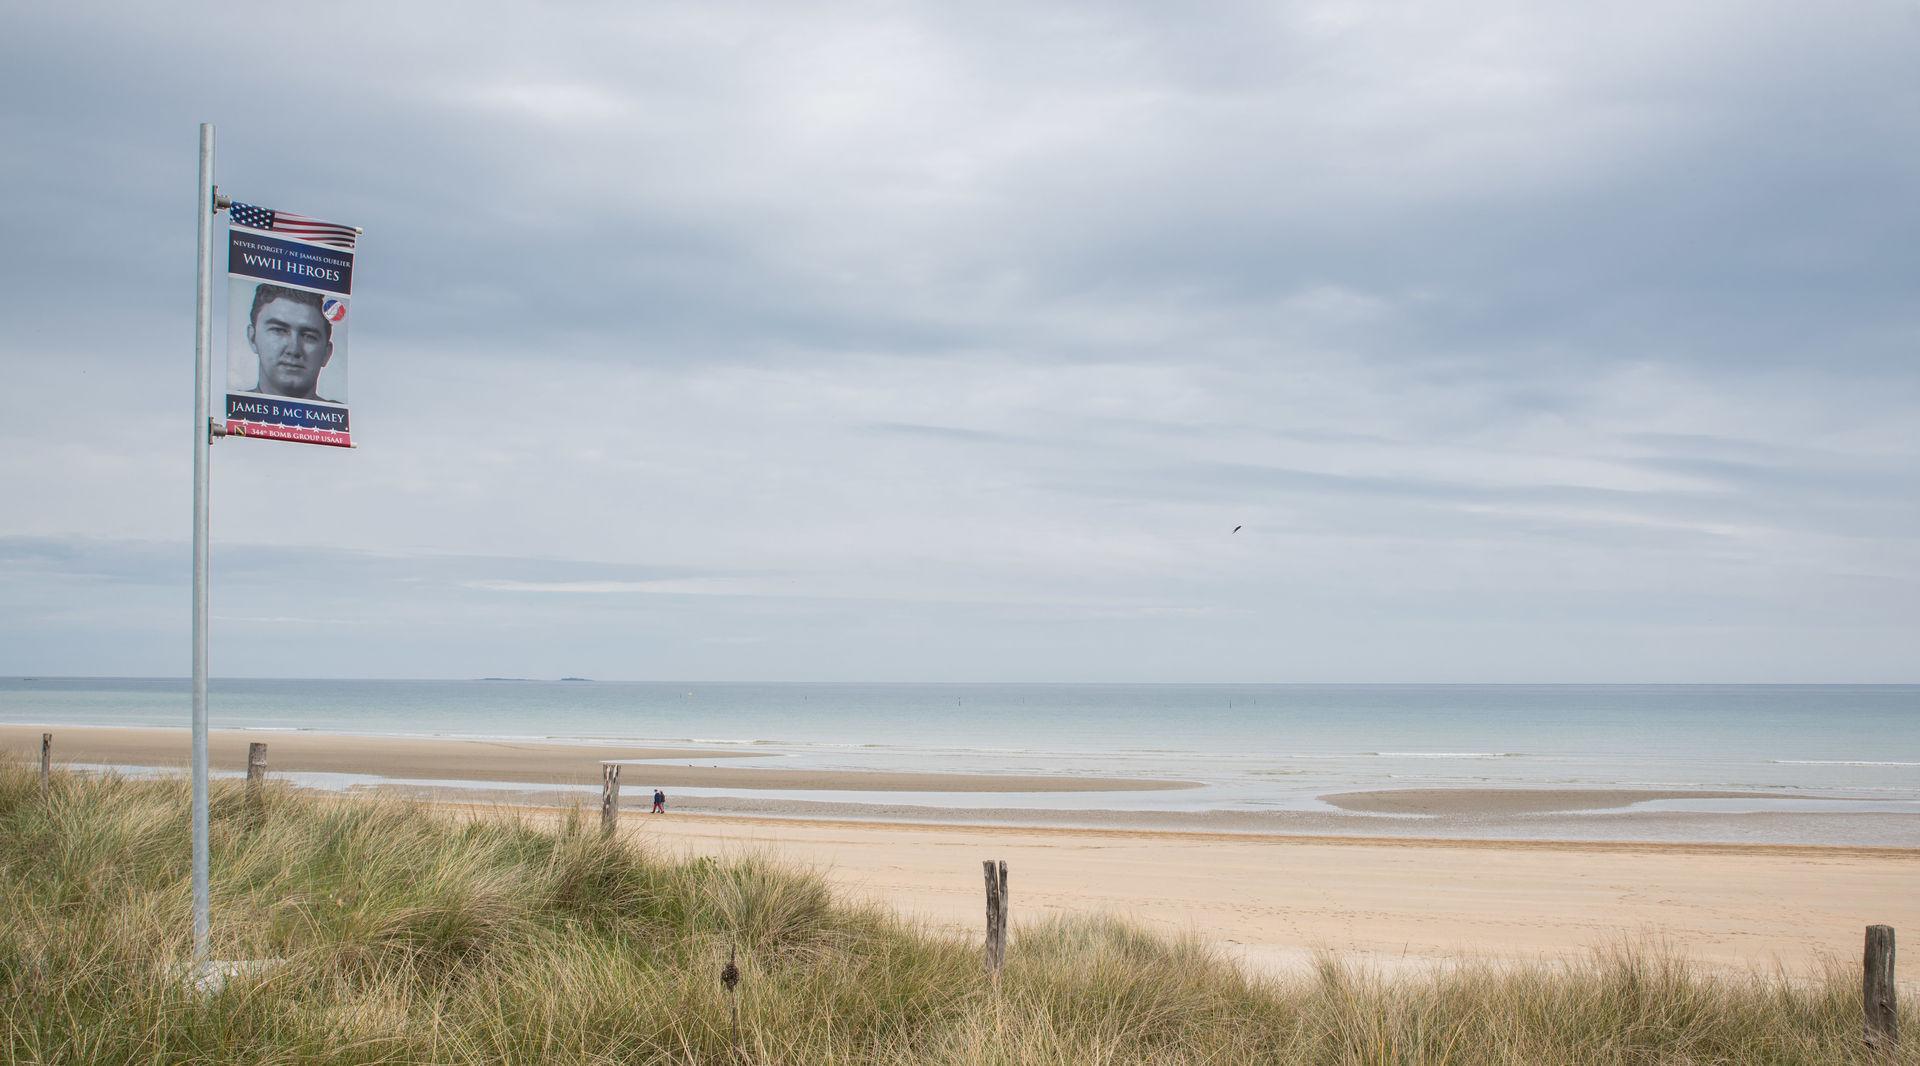 normandia05-utah-beach.jpg